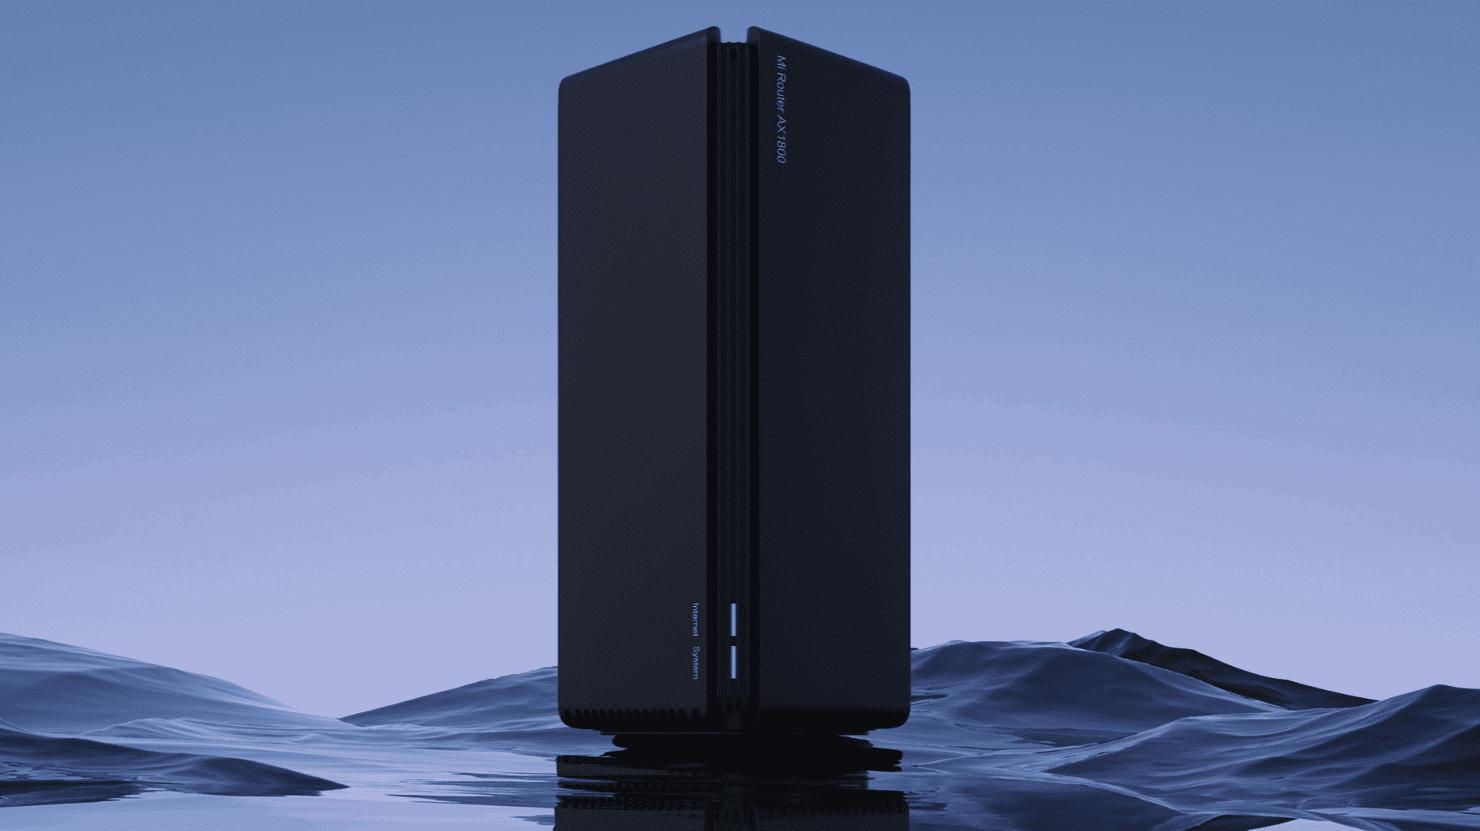 Xiaomi-Mi-Router-AX1800-tekcore